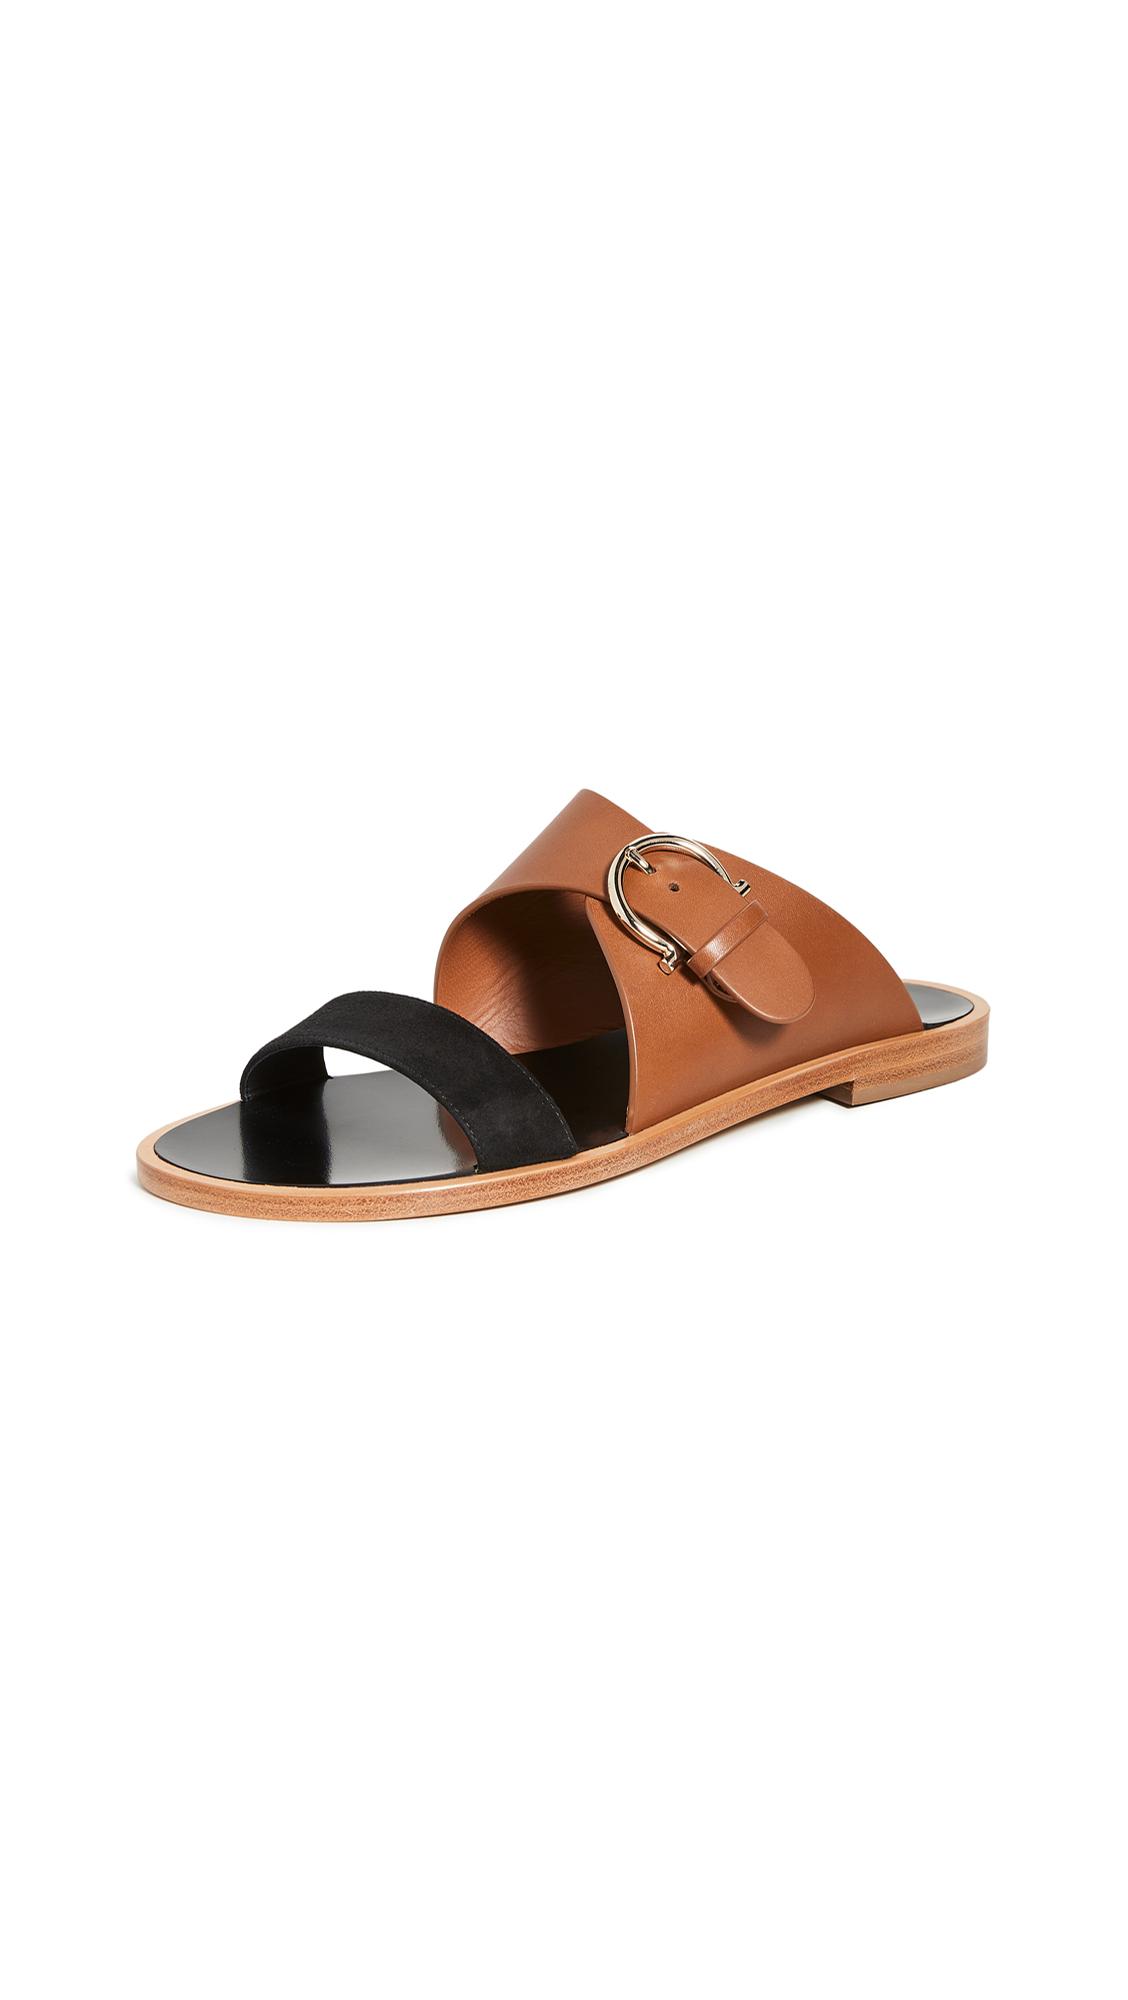 Buy Salvatore Ferragamo online - photo of Salvatore Ferragamo Cassie 10mm Sandals